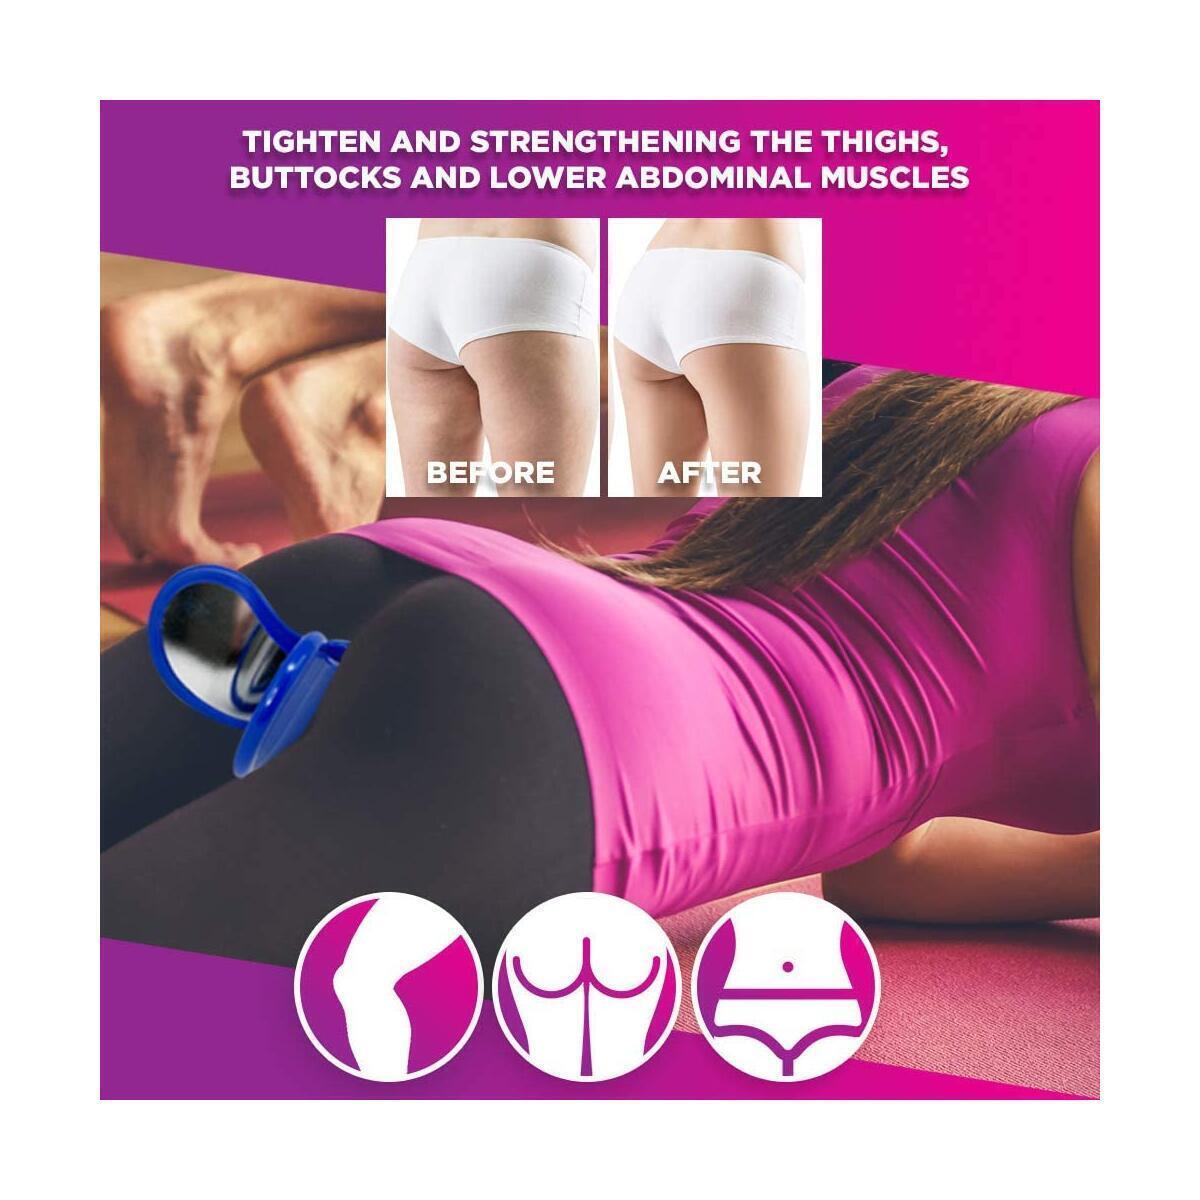 Hip Trainer - Butt Workout Equipment For Women - Pelvic Floor Muscle And Inner Thigh Exerciser - Glute Trainer - Booty Trainer - Glute Workout Equipment - Workout Equipment For Women